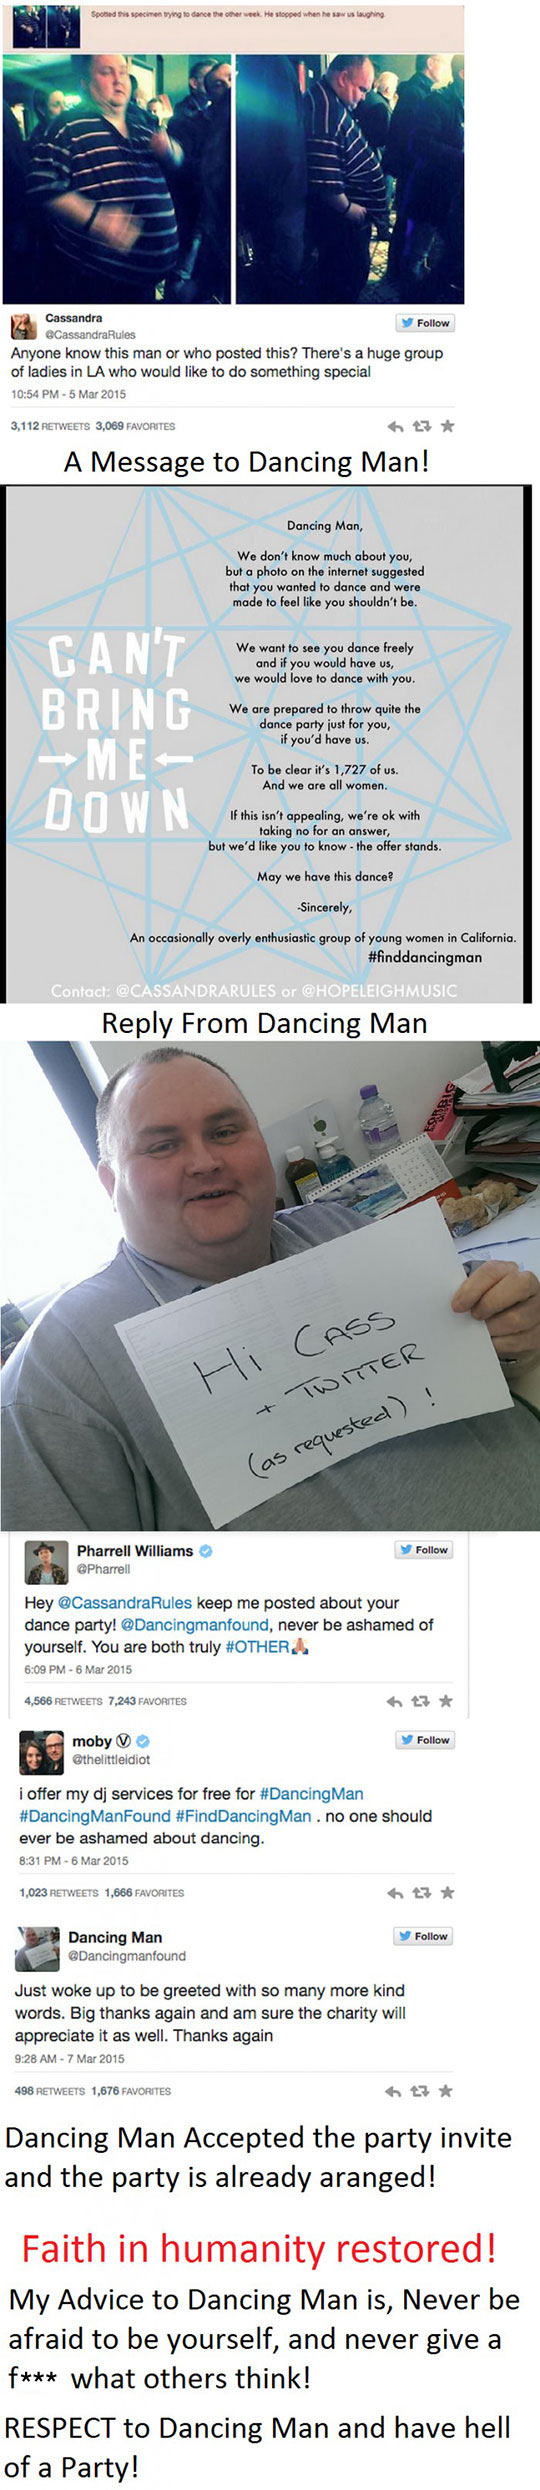 cool-dancing-fat-man-story